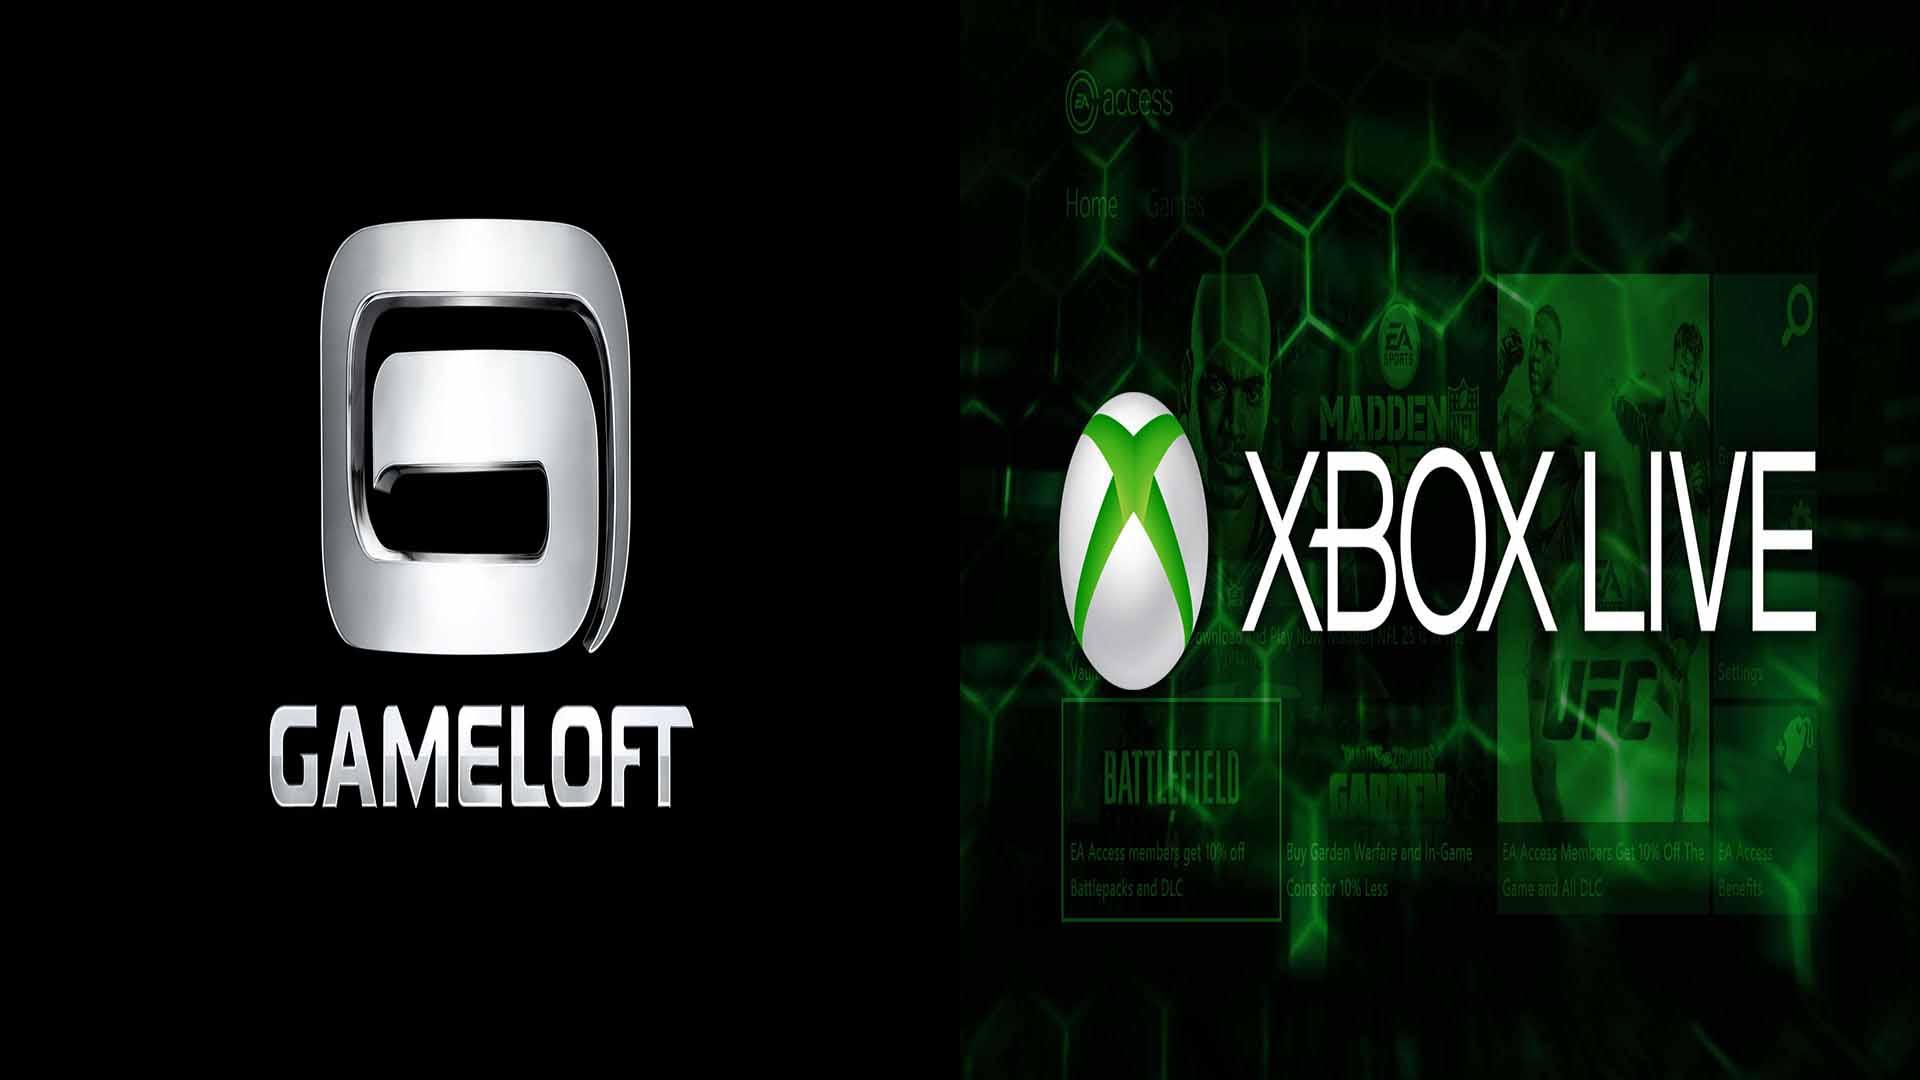 Gameloft xbox live microsoft